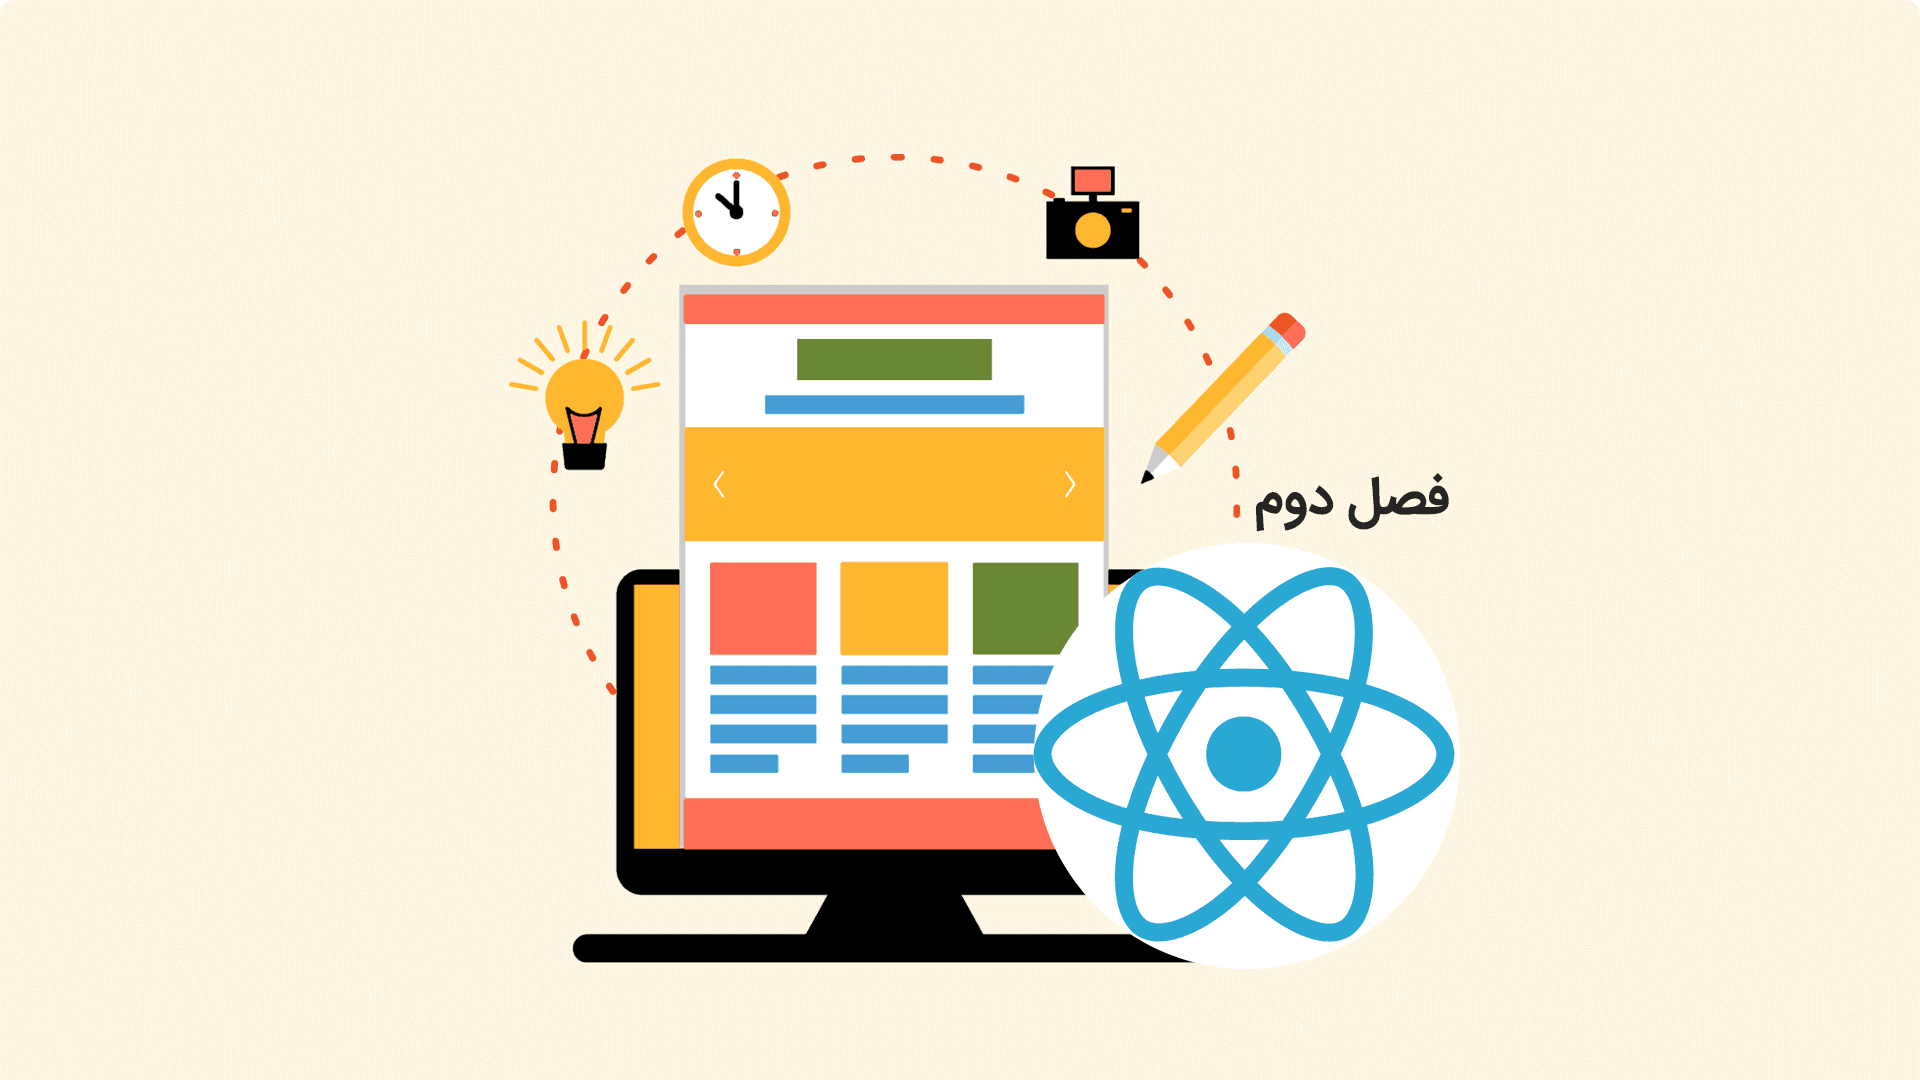 آموزش React js – فصل دوم (پروژه نماوا)